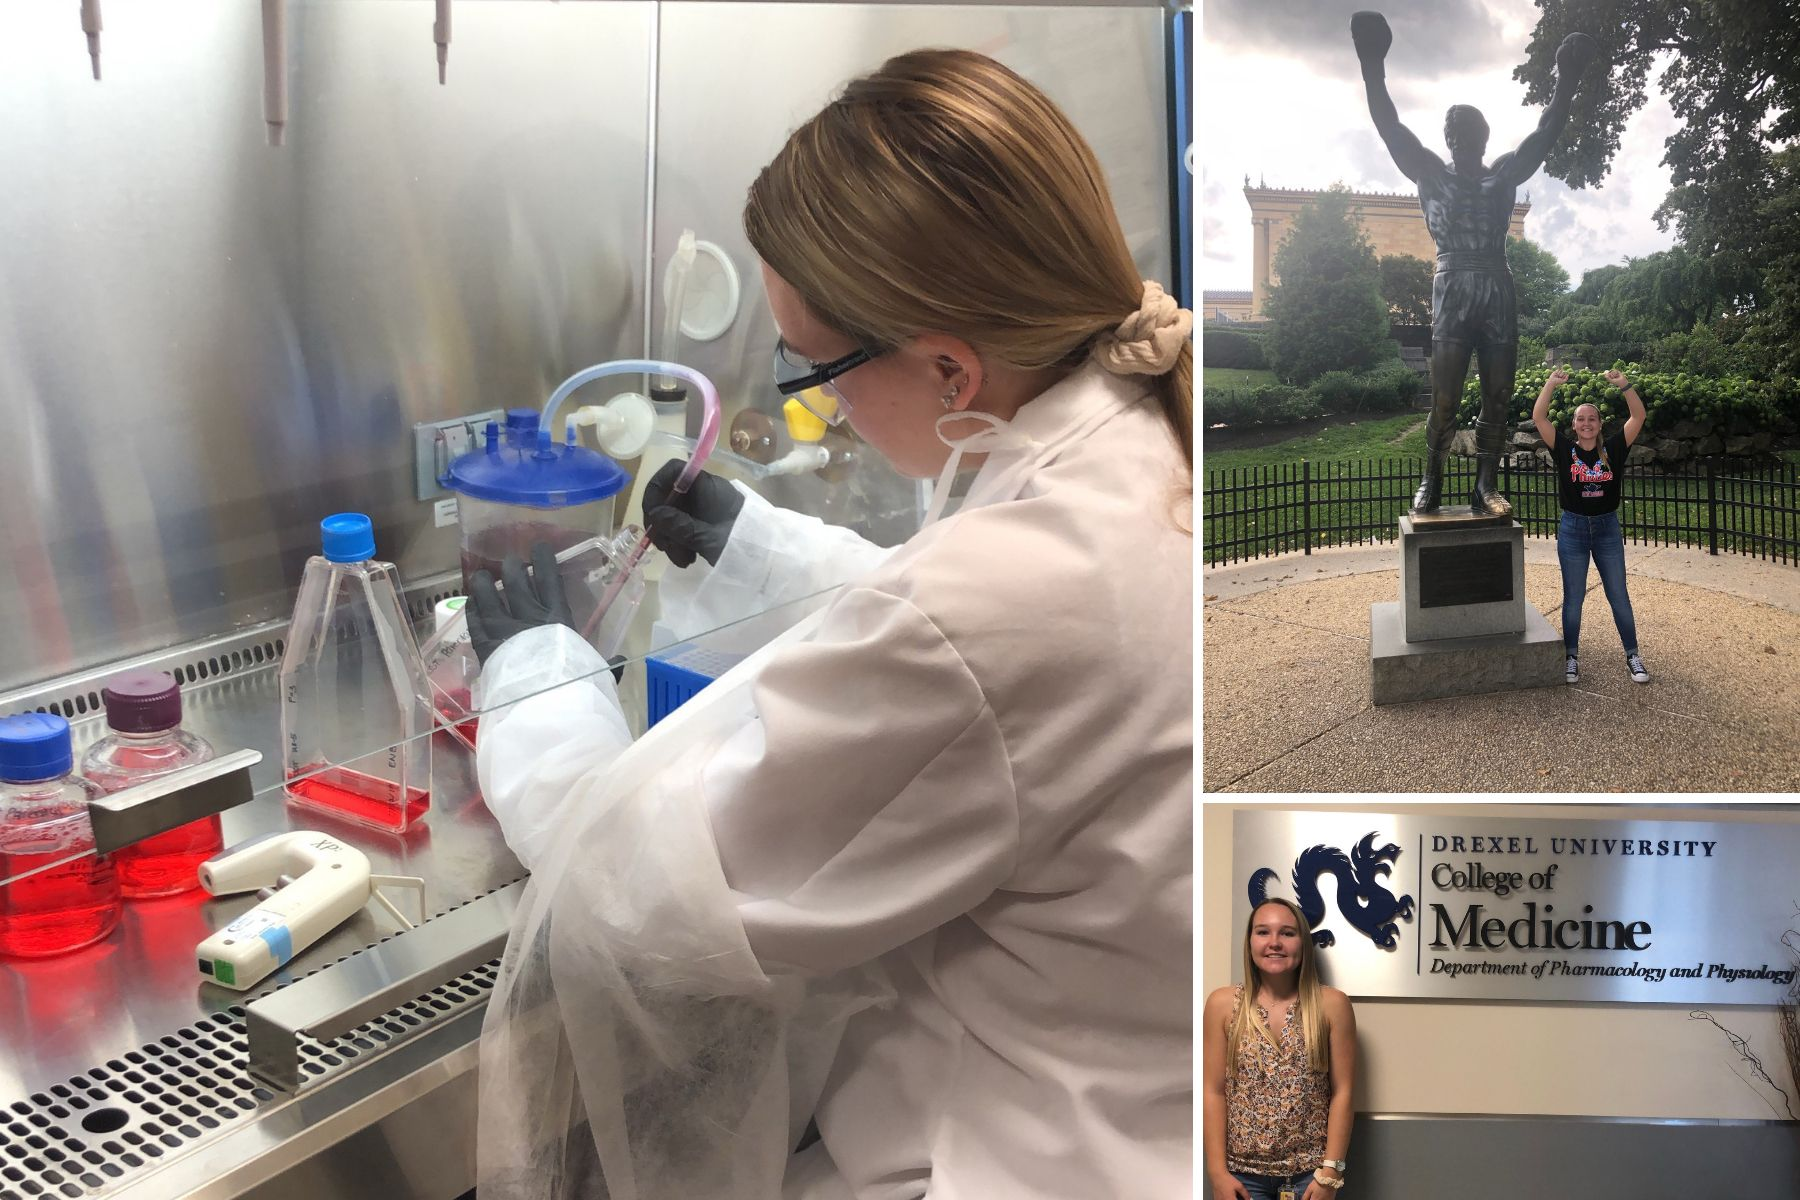 Kimmy Bonar '21 working in a lab during her internship at Drexel University in Philadelphia.